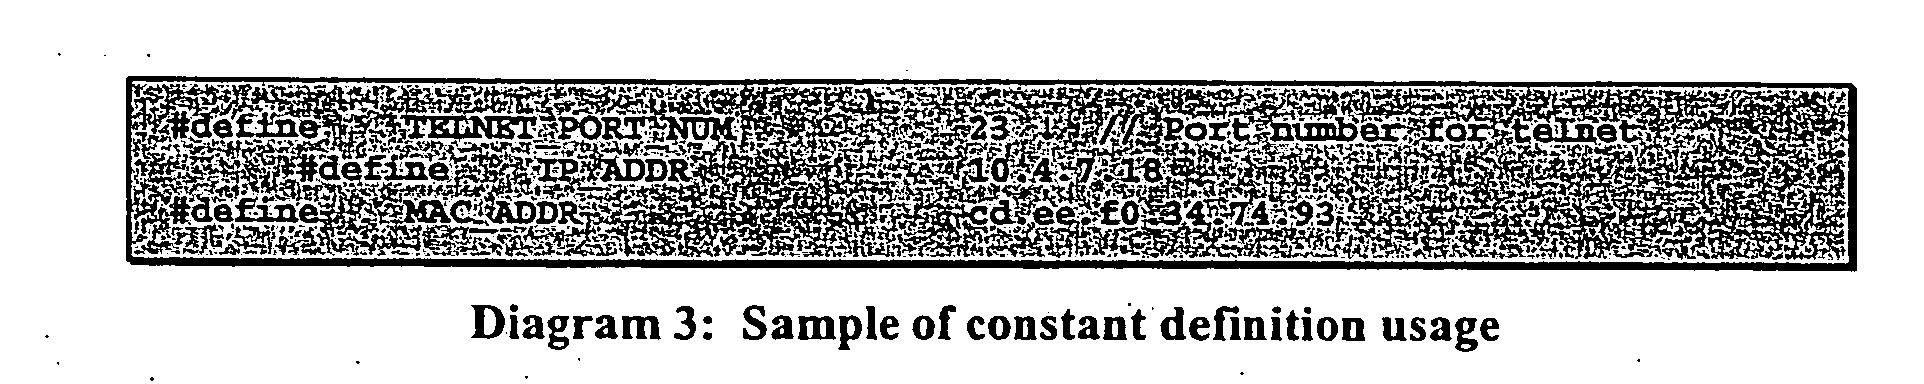 Figure US20040148382A1-20040729-P00003